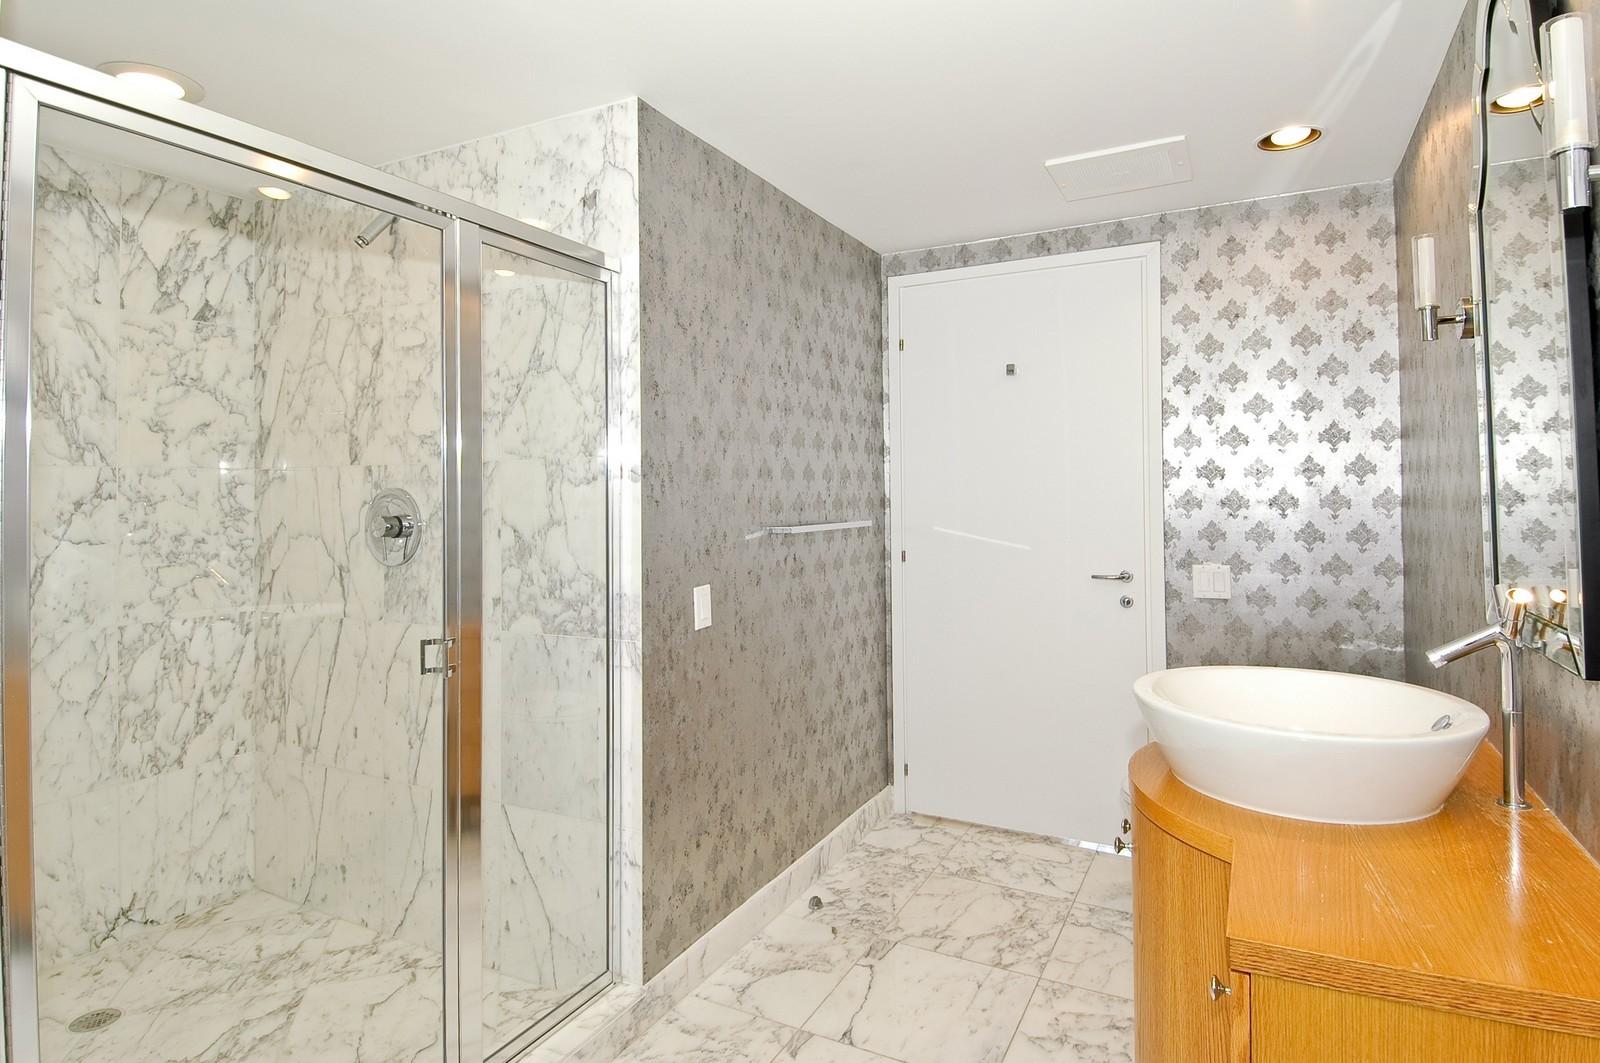 Real Estate Photography - 450 Alton Rd, Unit 2910, Miami Beach, FL, 33139 - Bathroom